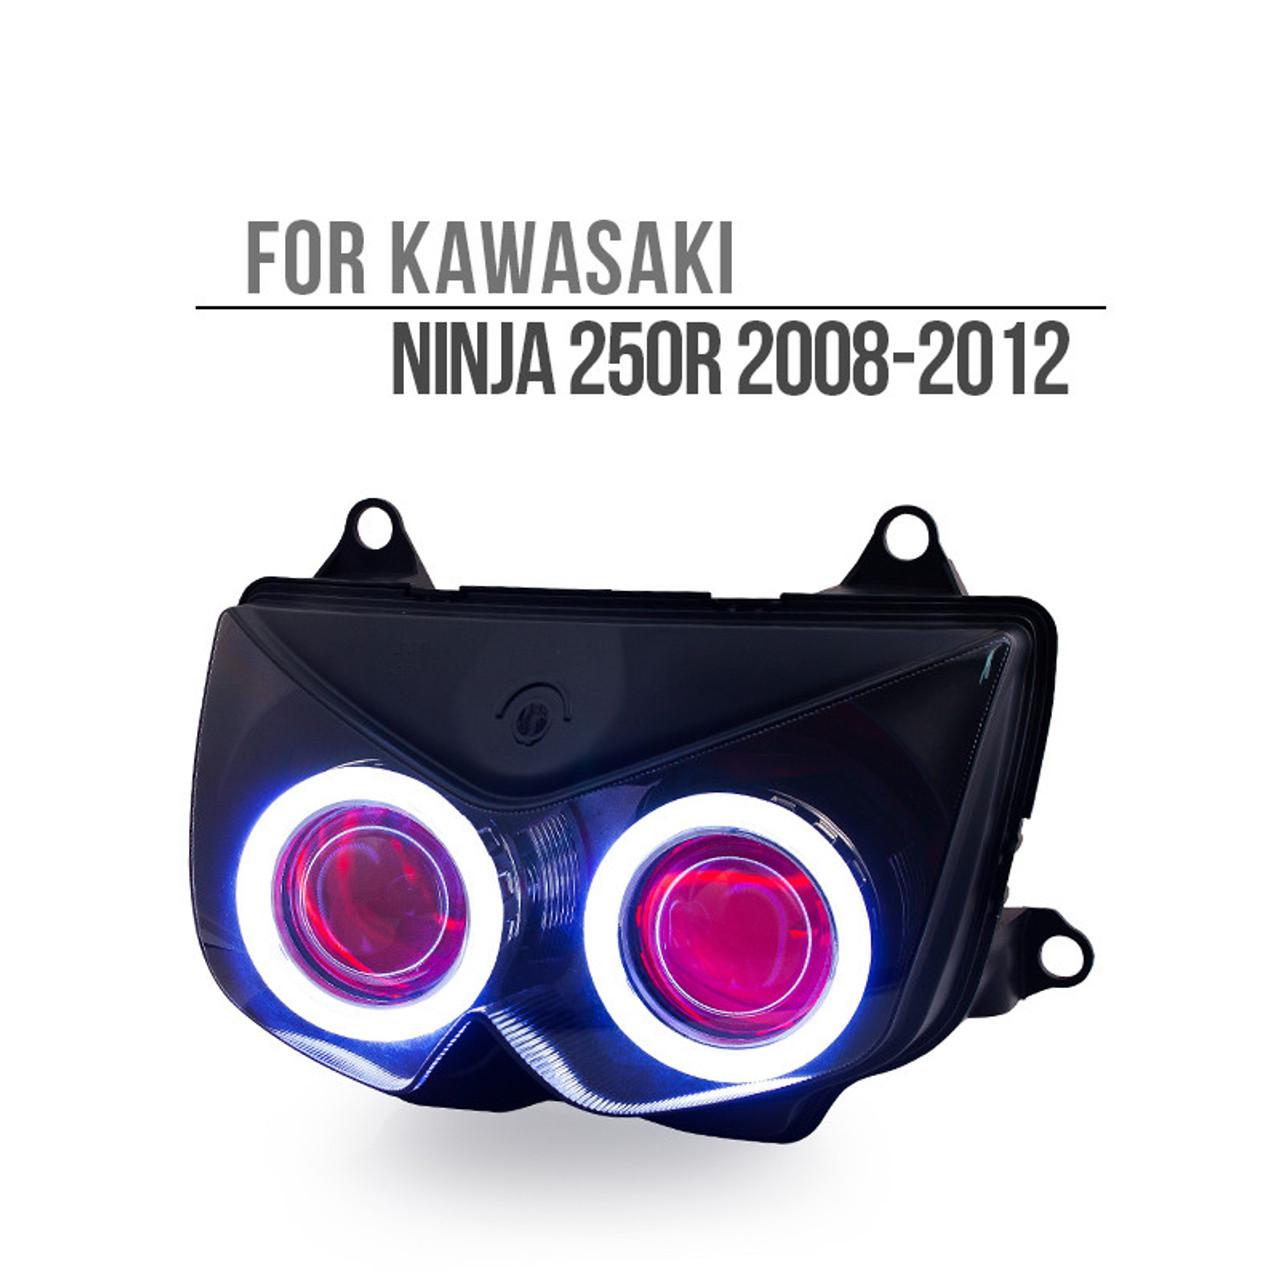 2008 2009 2010 2011 2012 Kawasaki Ninja 250R Headlight